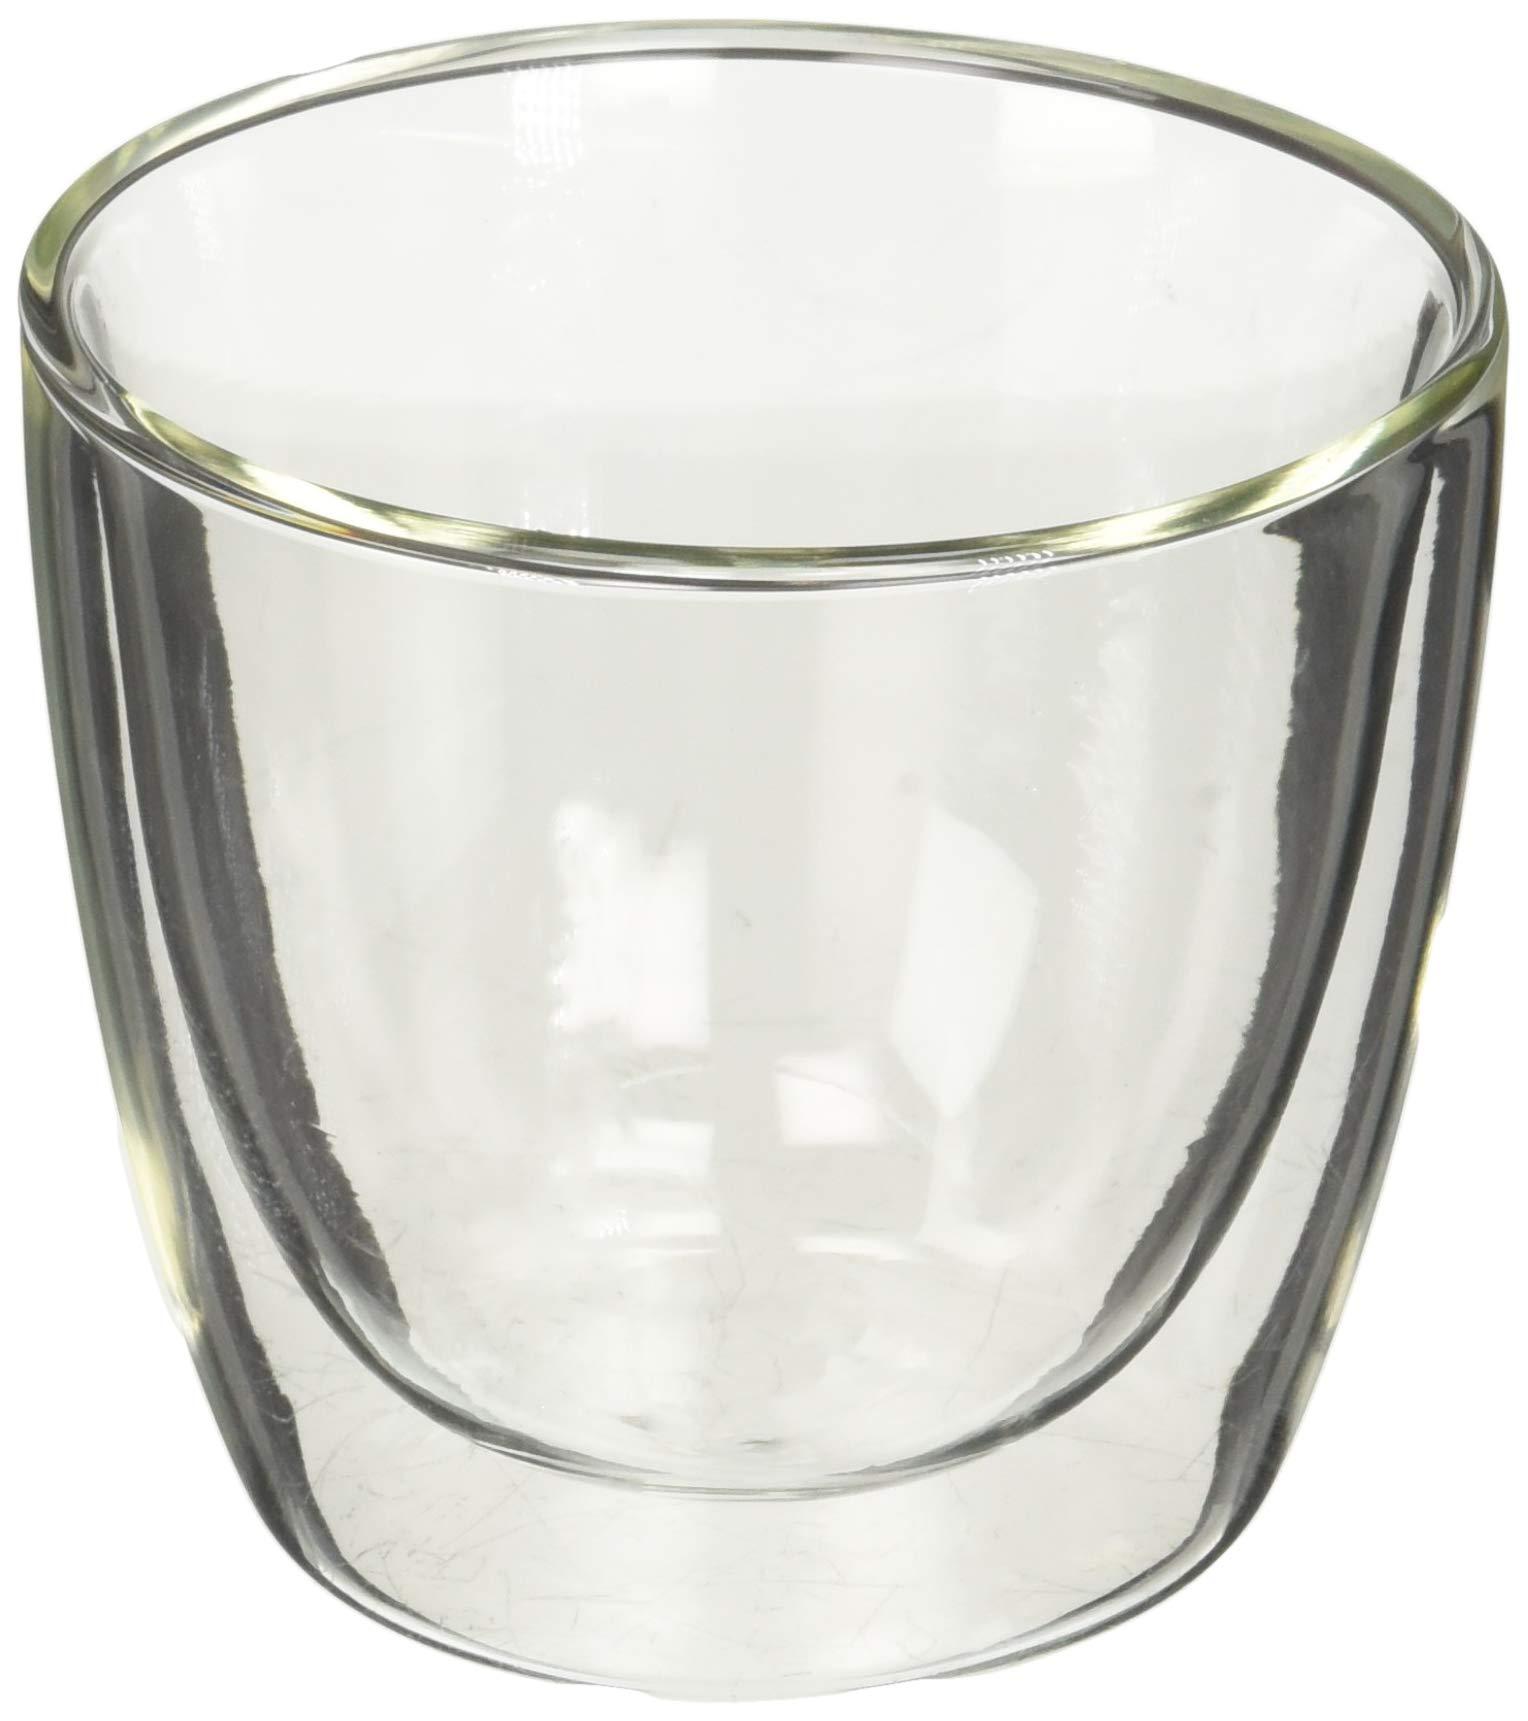 Villeroy & Boch 1172438091 Artesano Hot Beverages